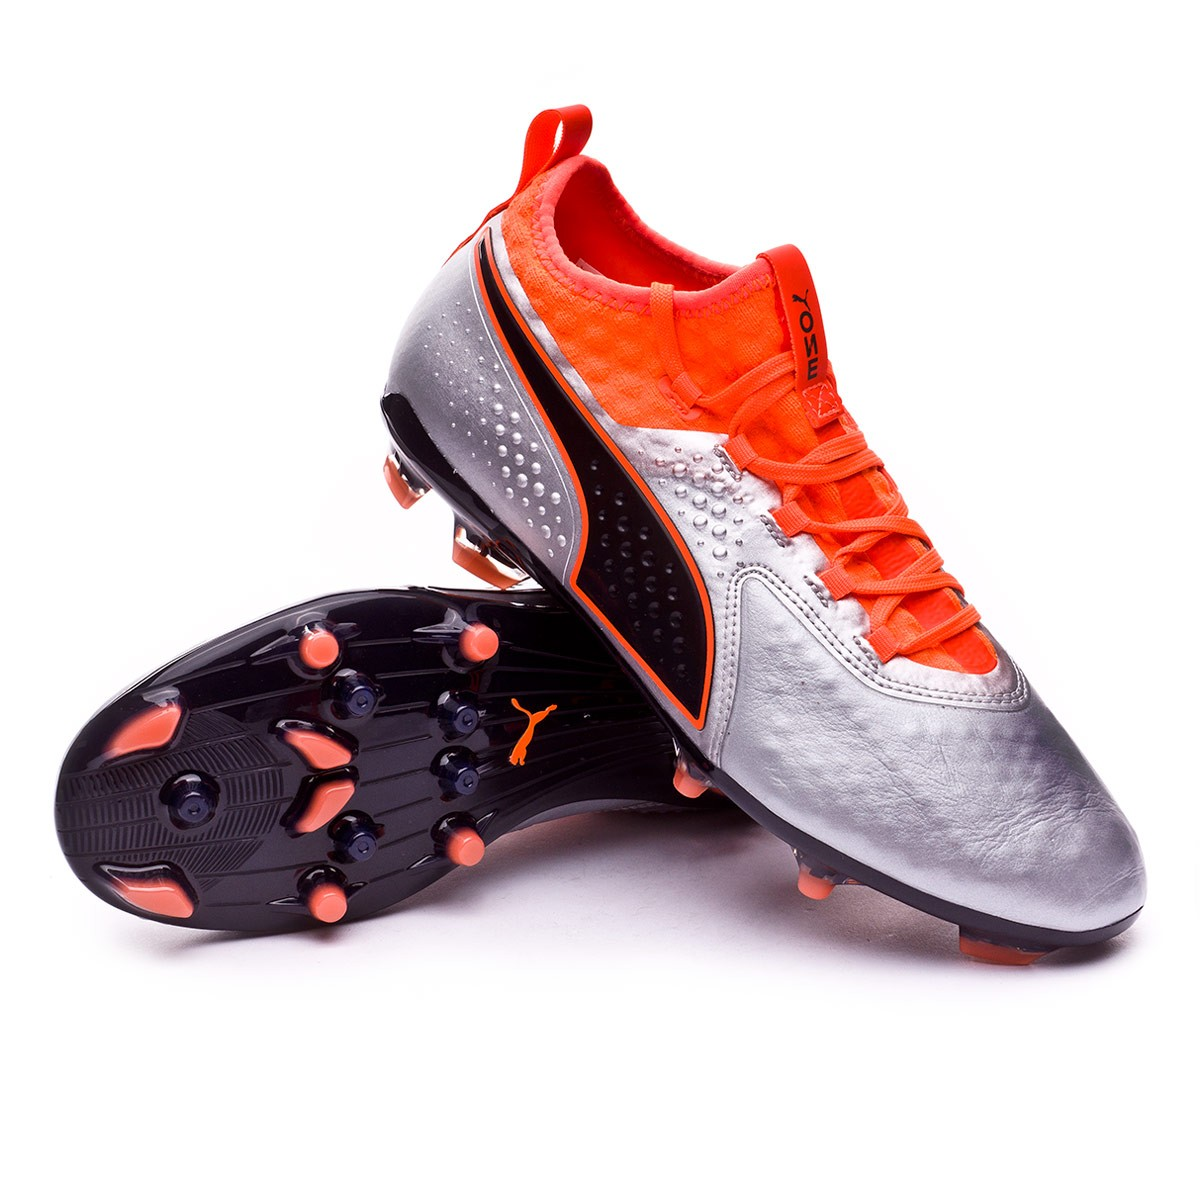 Football Boots Puma One 2 Leather AG